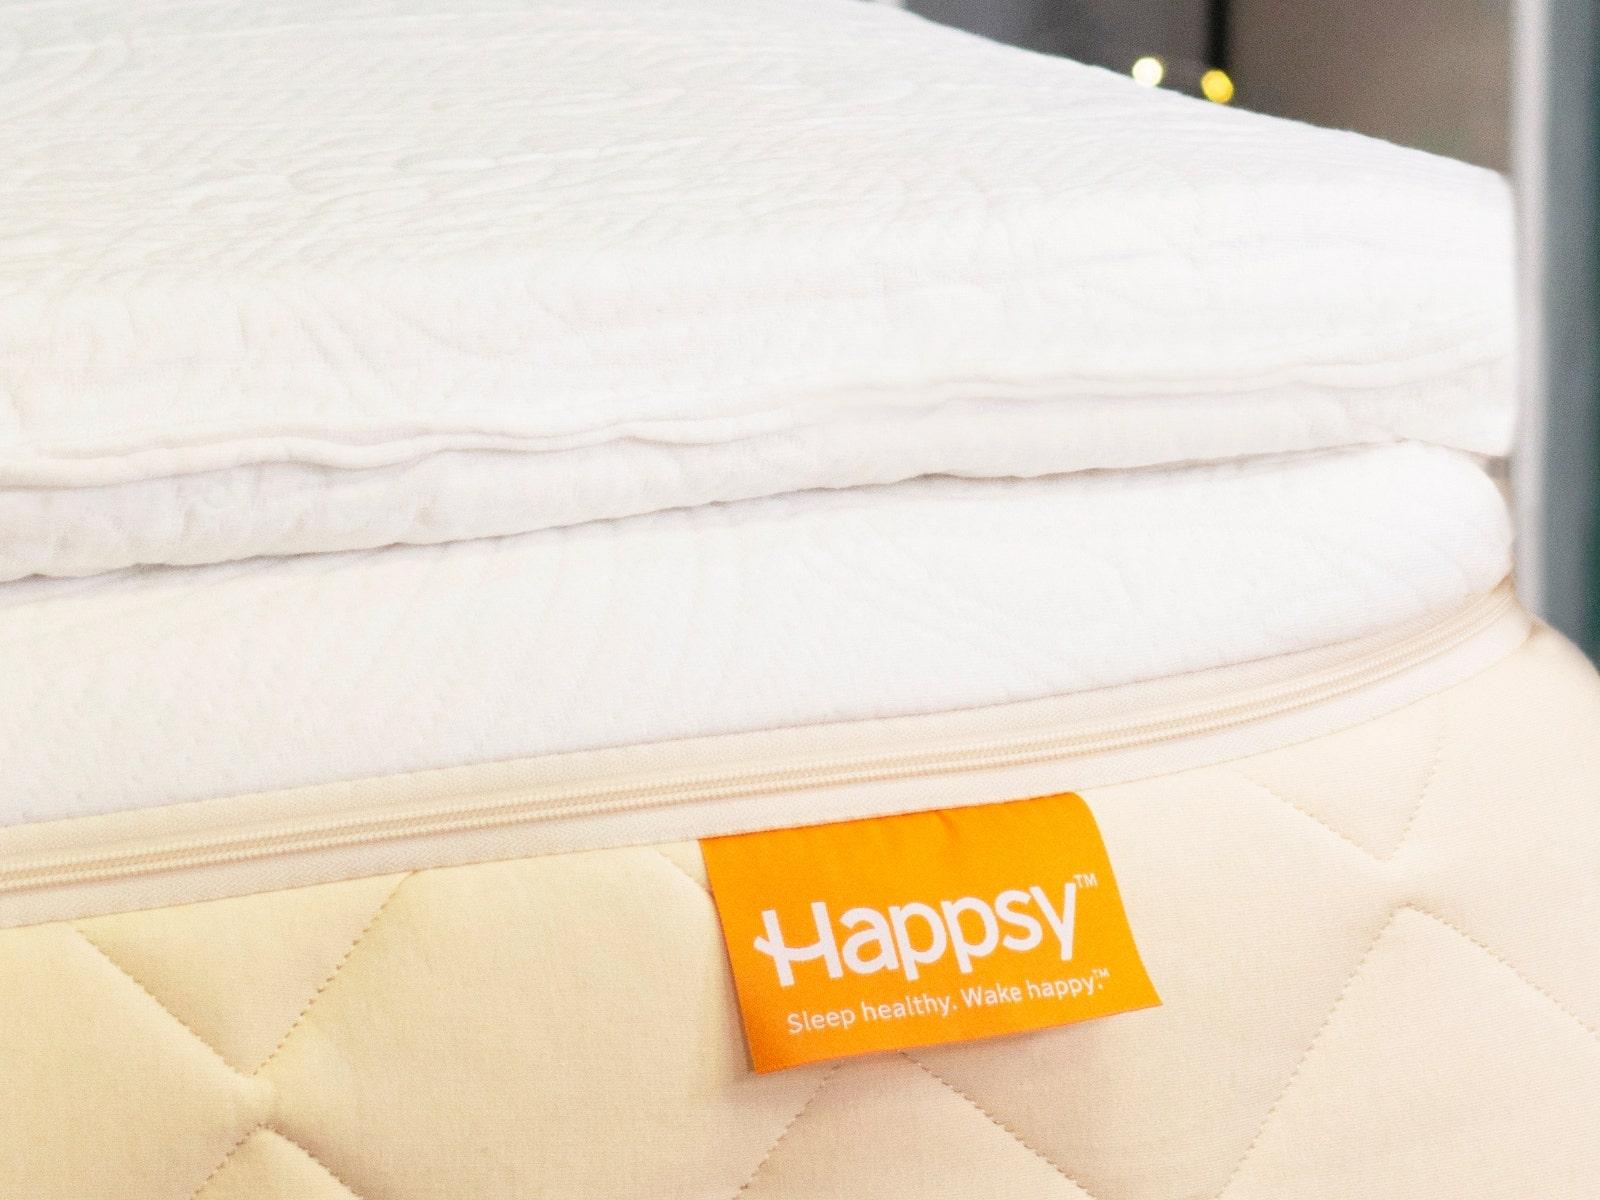 Happsy Mattress Topper